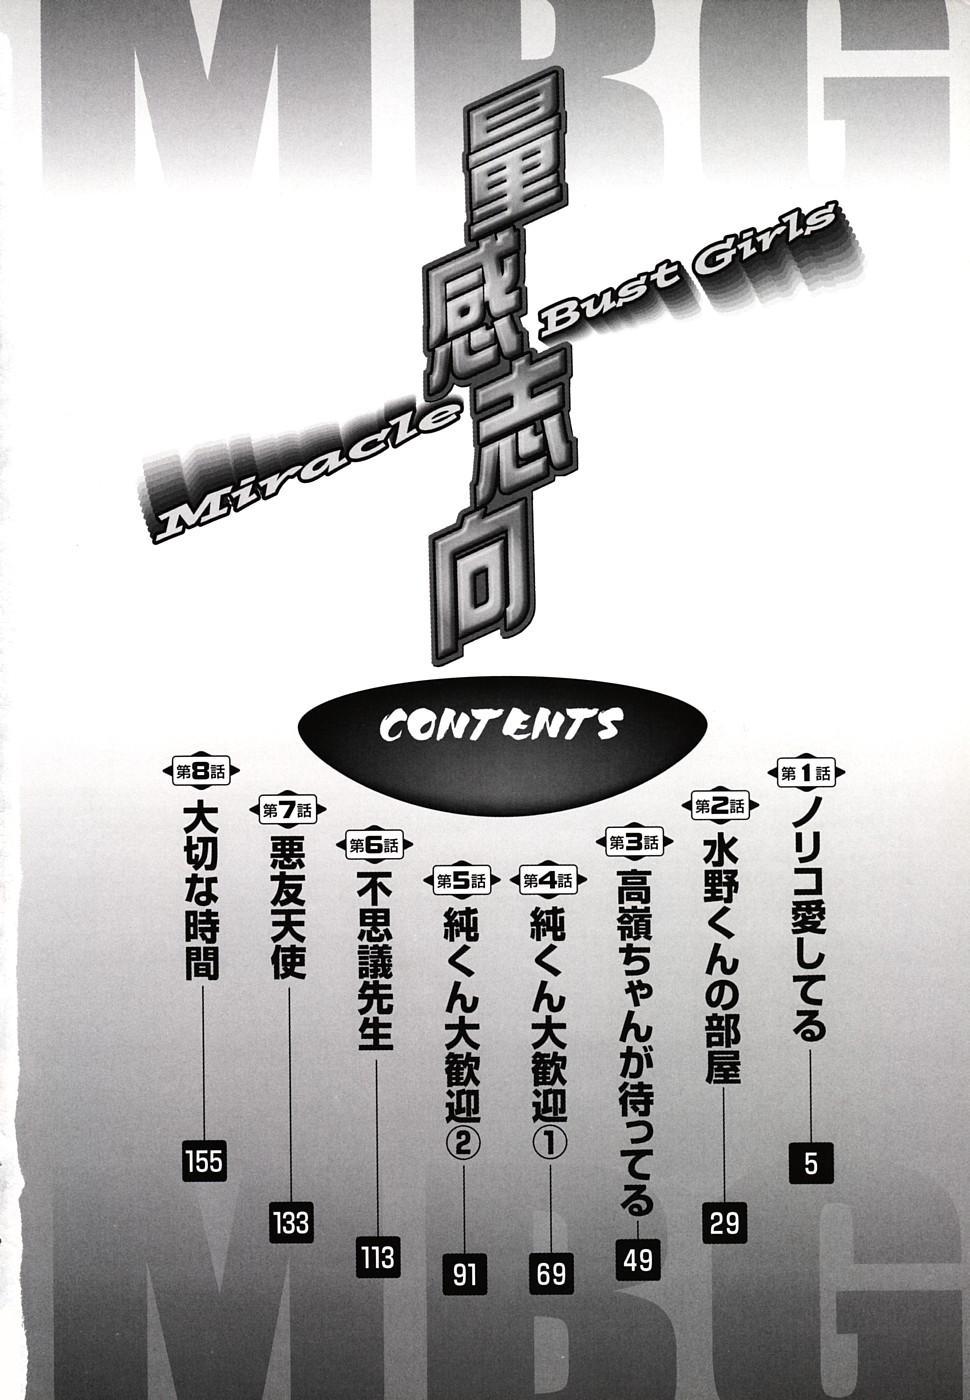 Ryoukan Shikou - Miracle Bust Girls 5